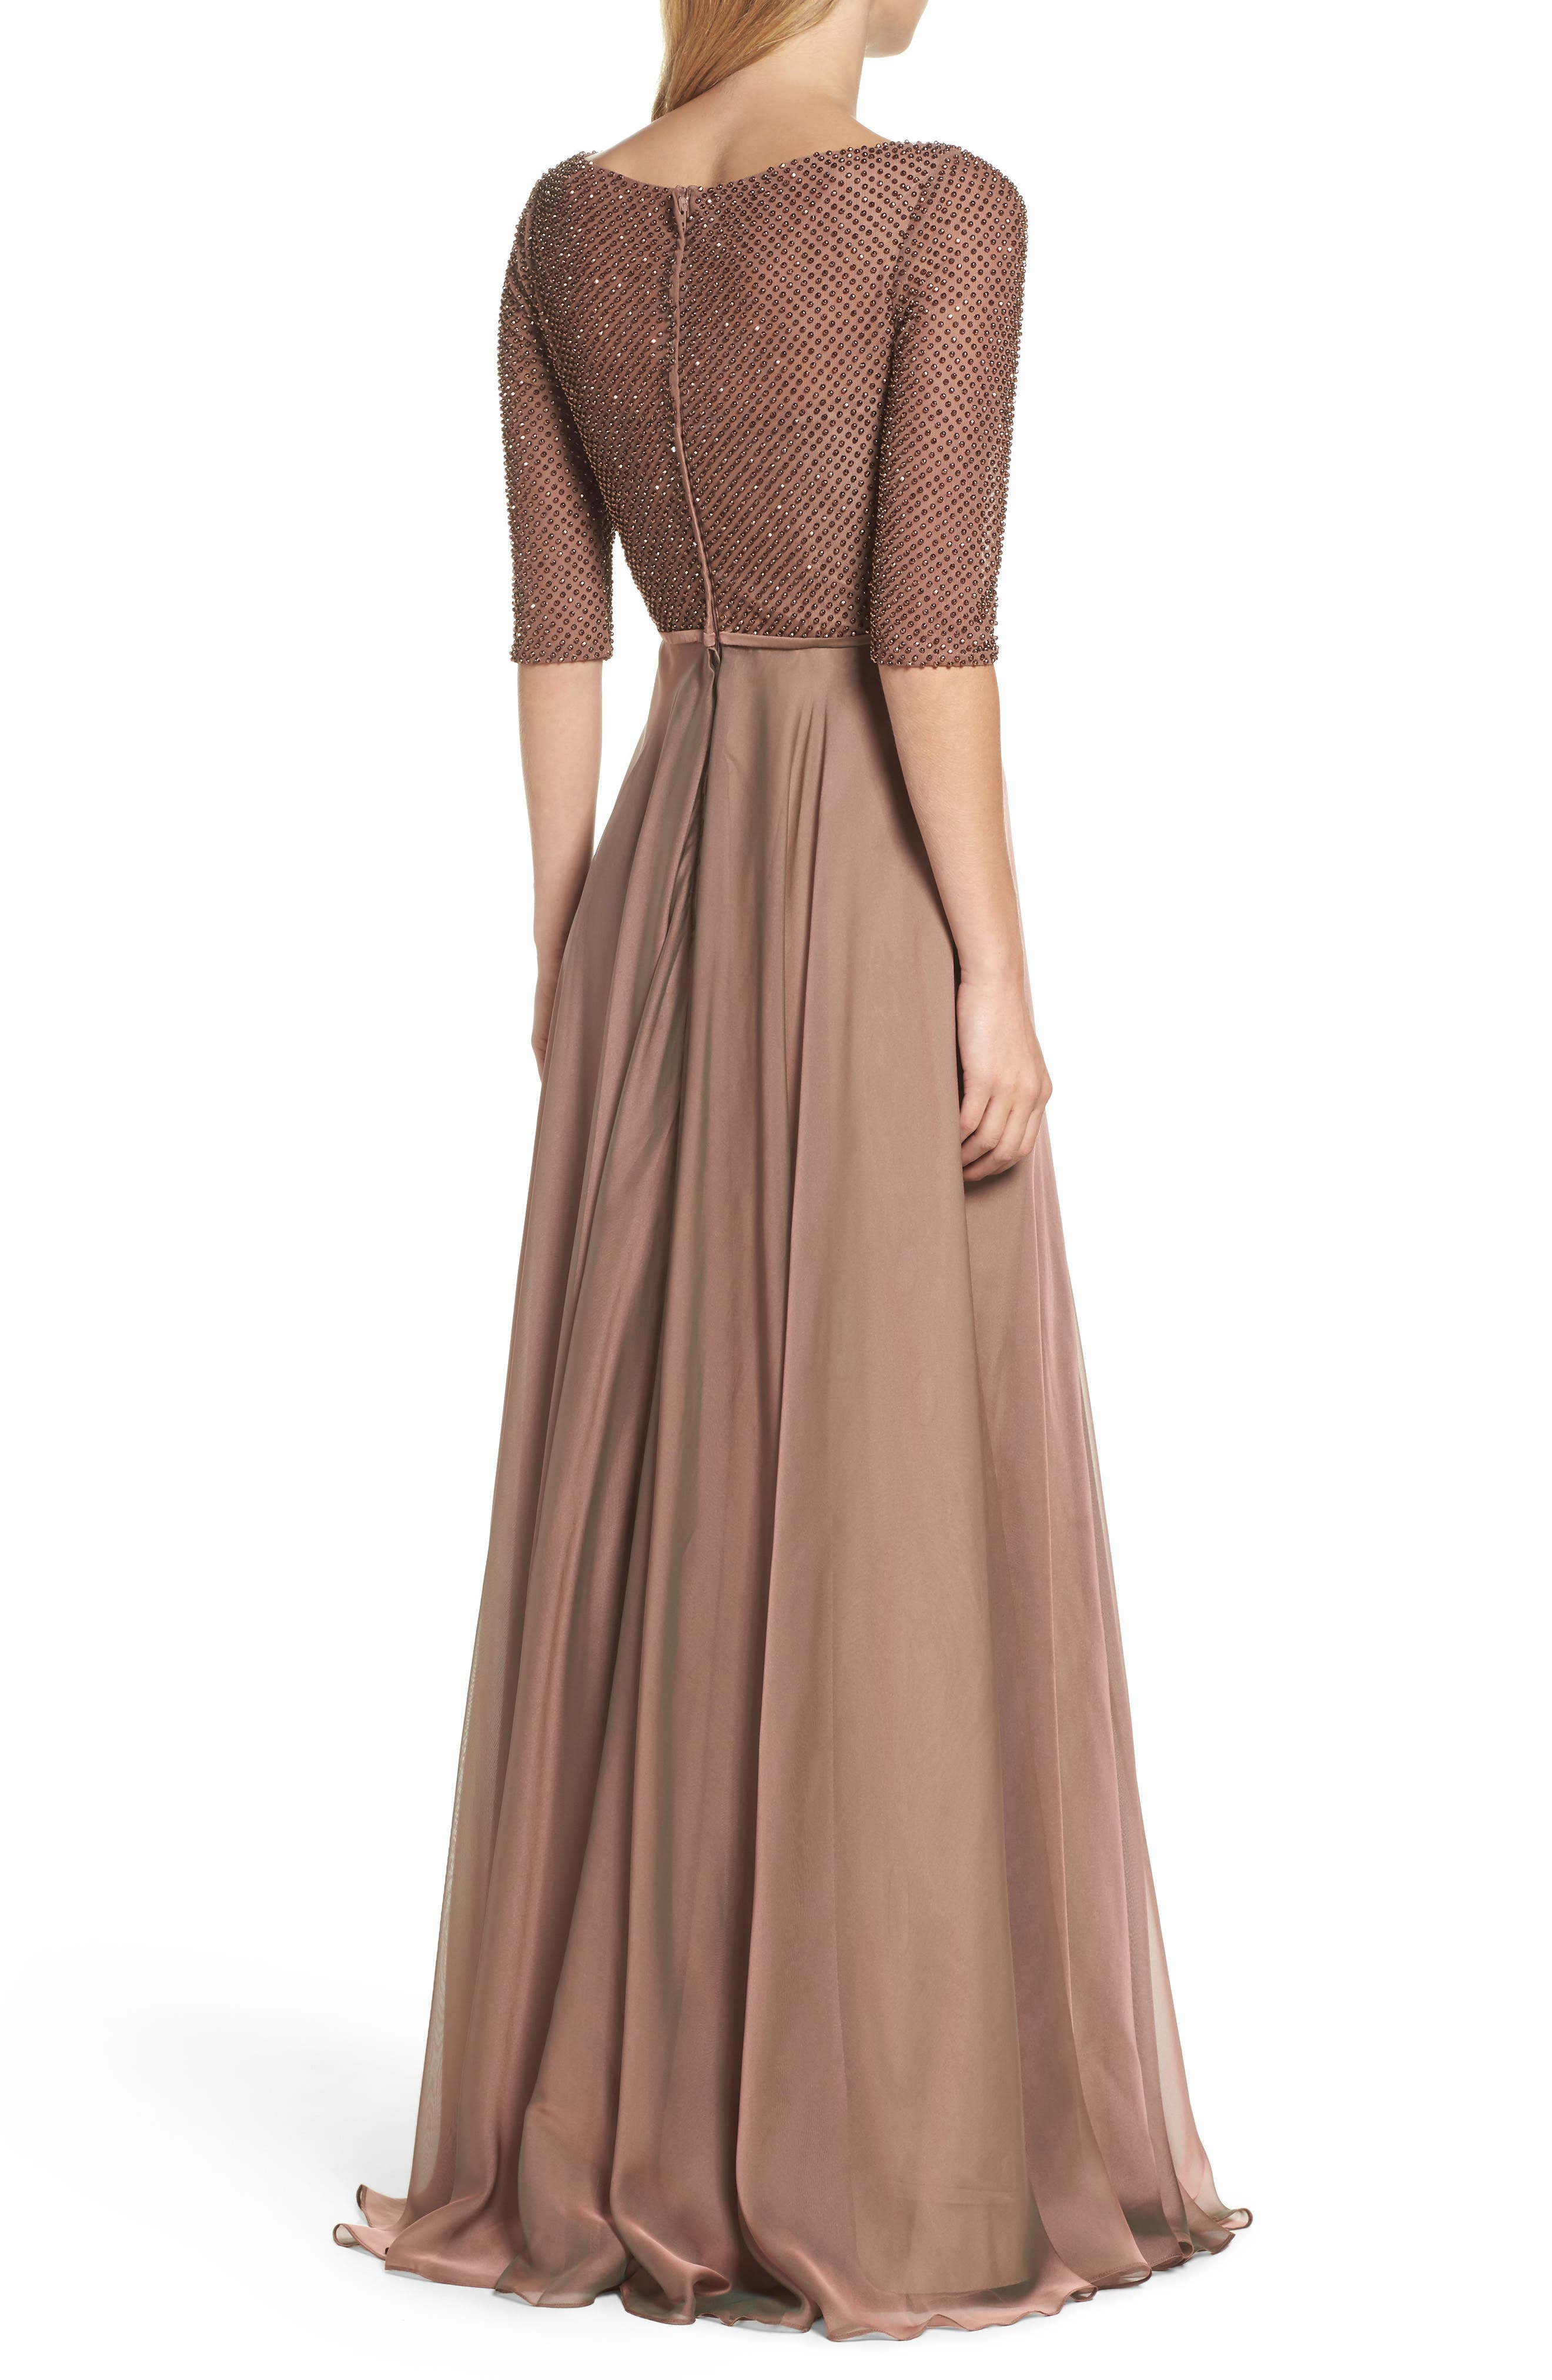 LA FEMME, Embellished Bodice Gown, Alternate thumbnail 2, color, COCOA